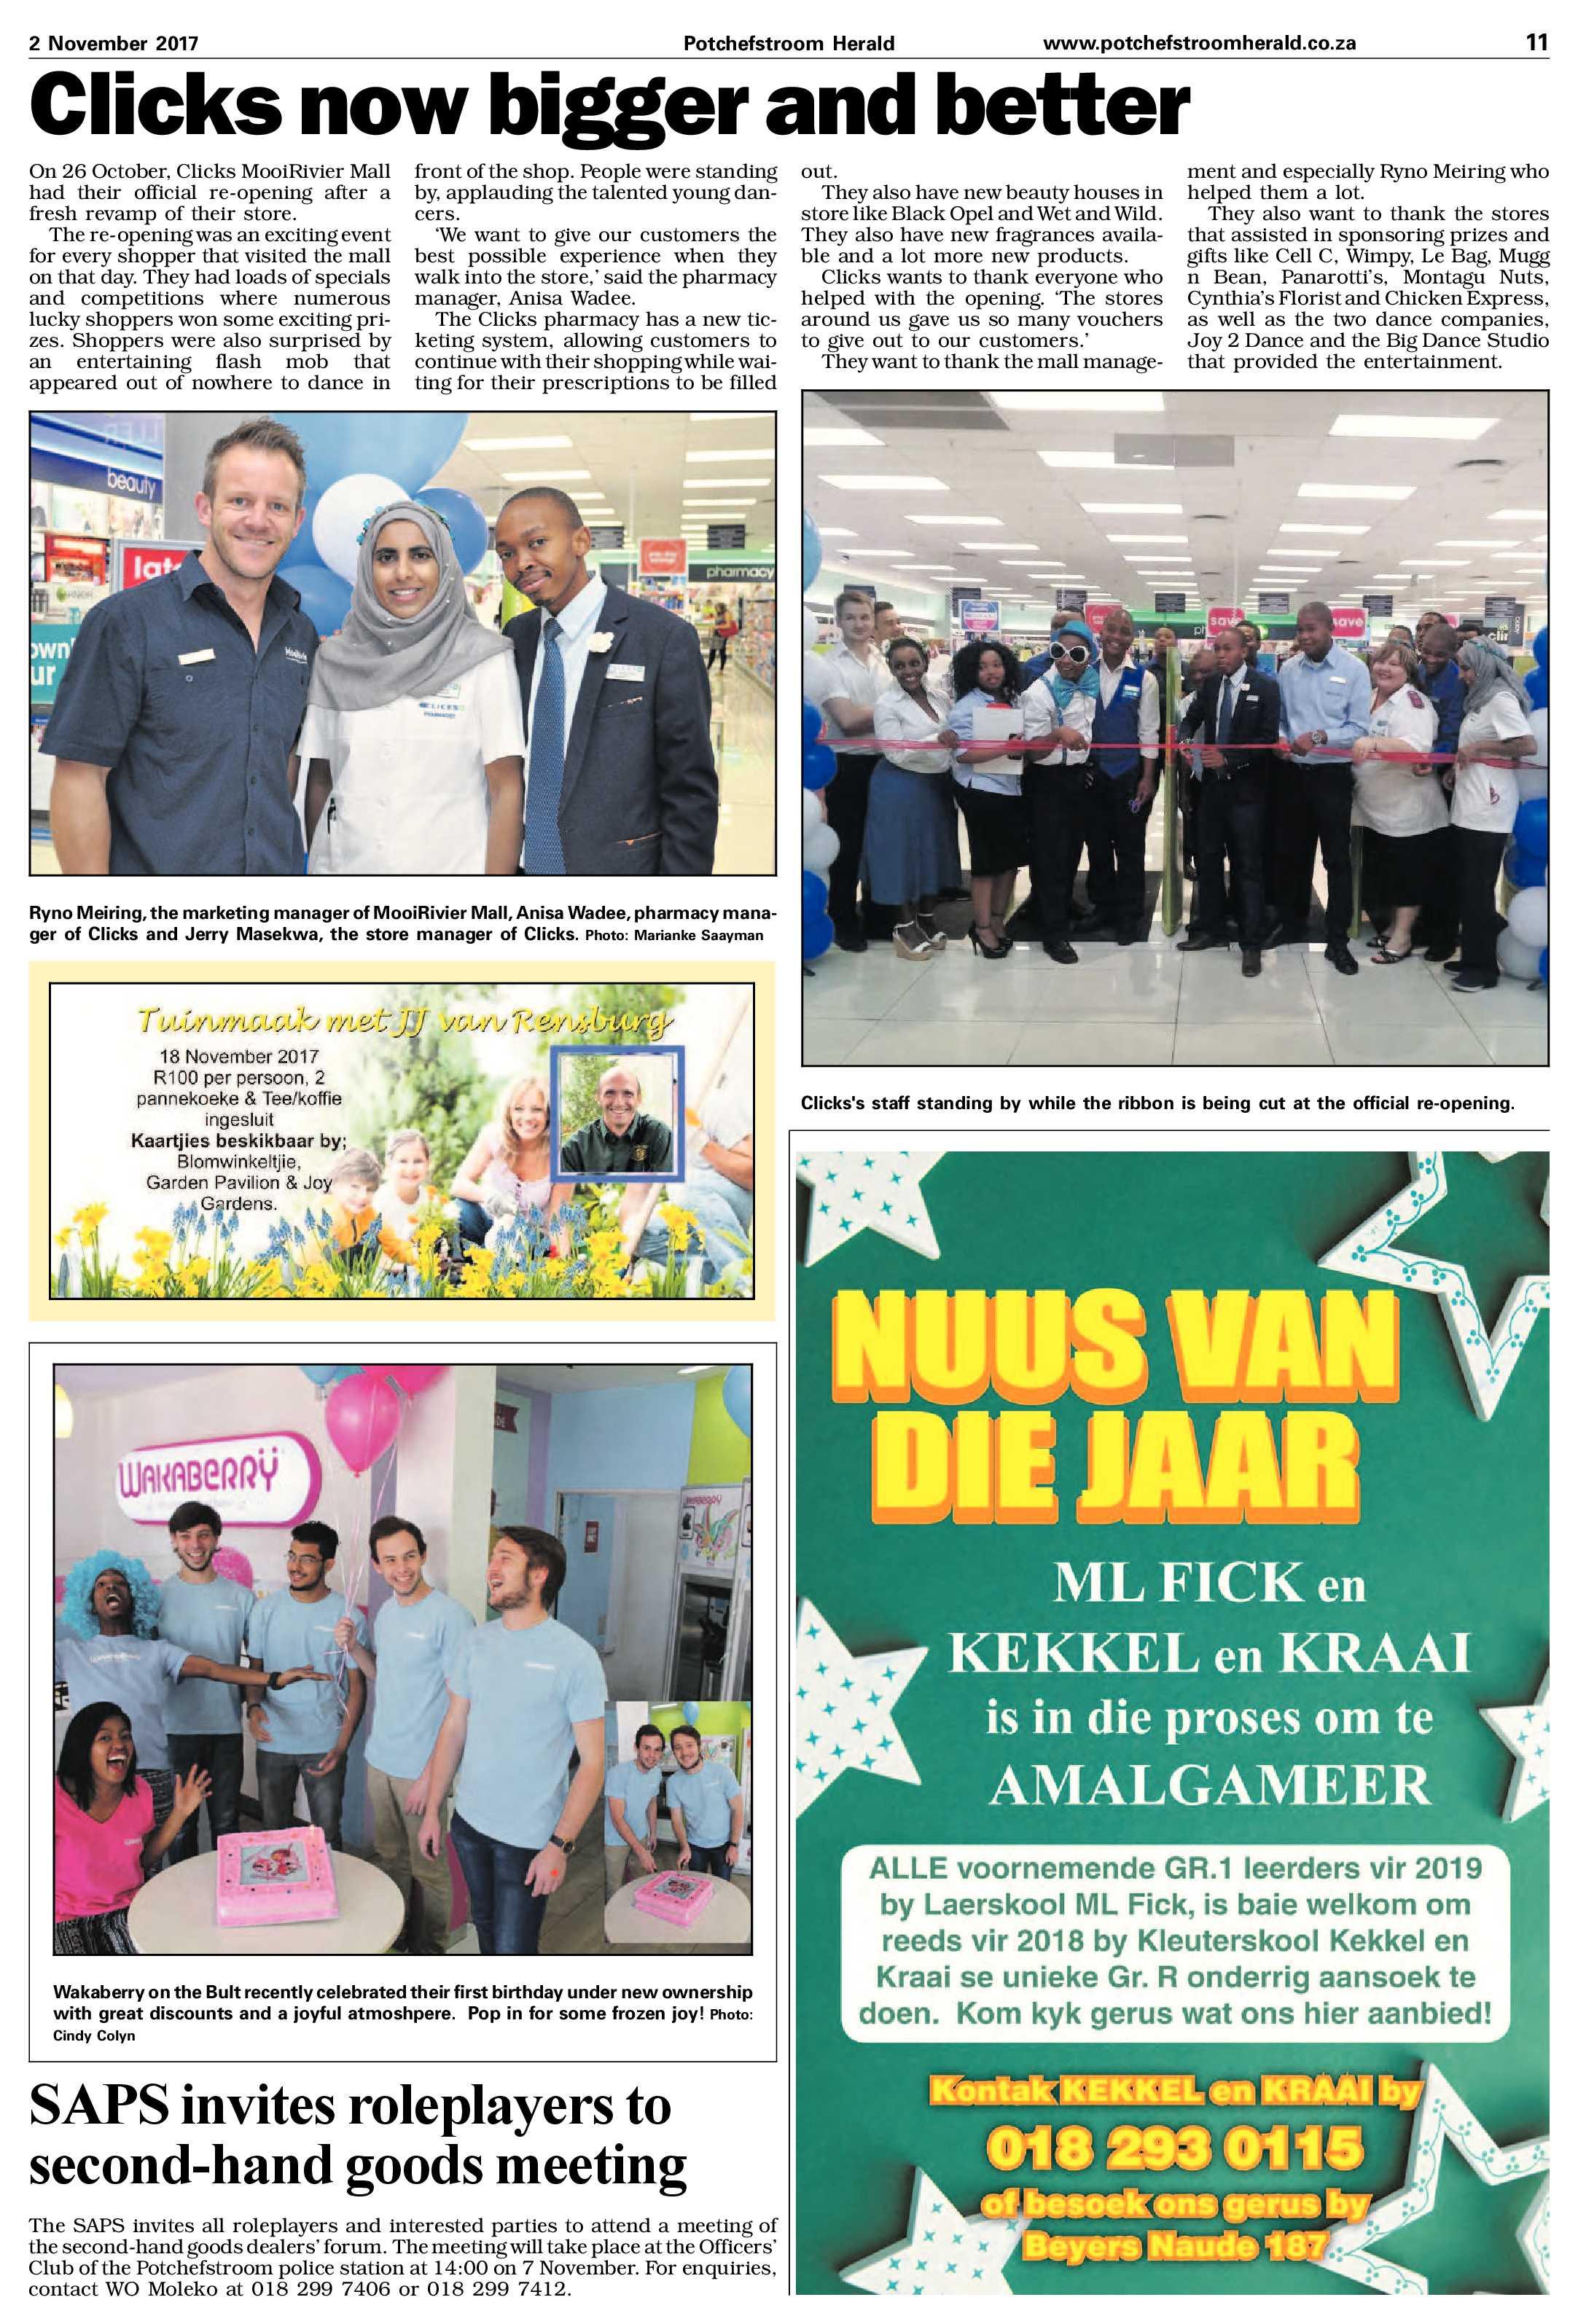 2-november-2017-epapers-page-12